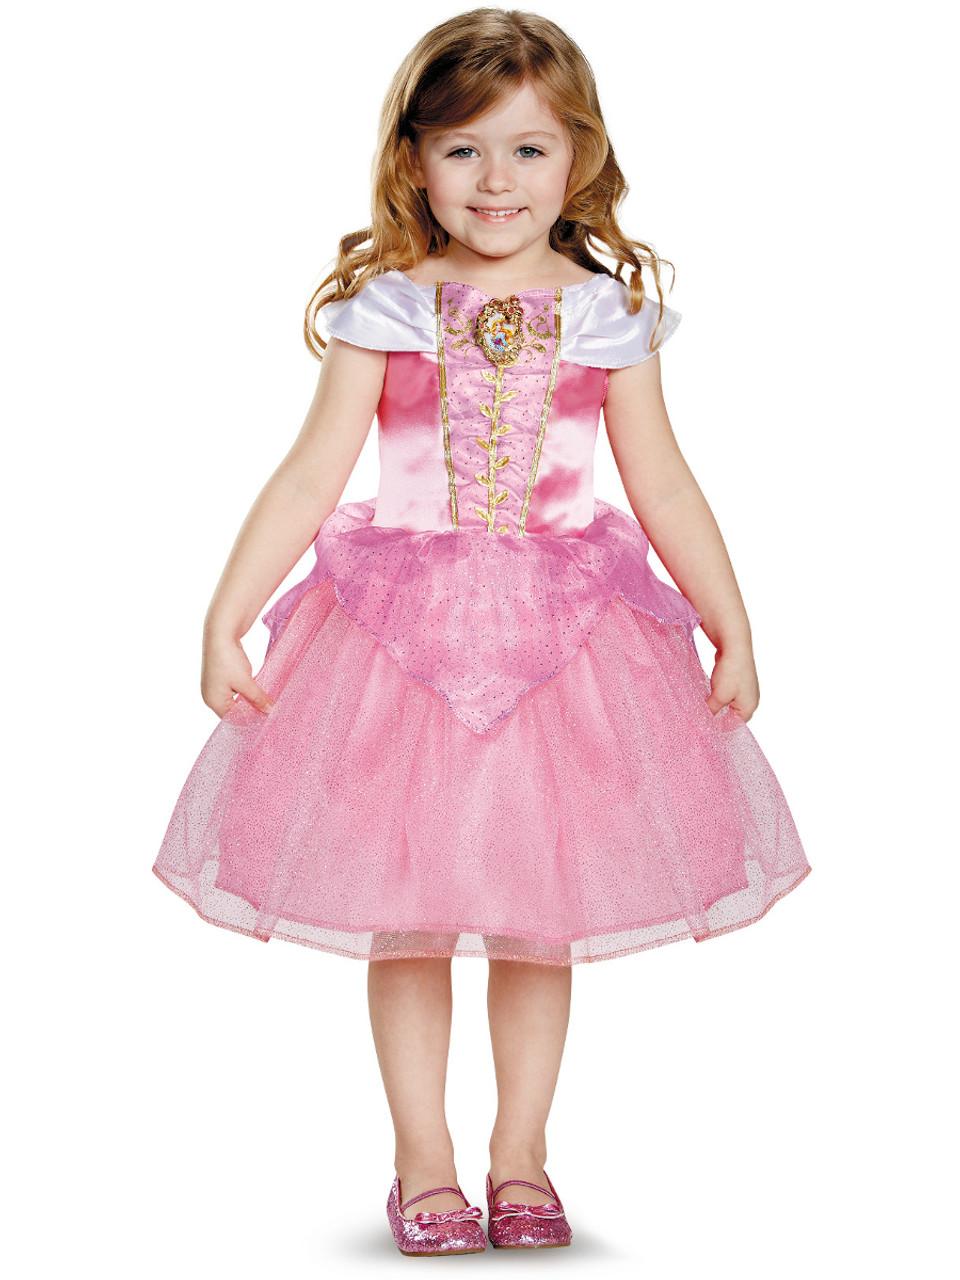 e41241439c2 Disney Aurora Sleeping Beauty Costume Dress